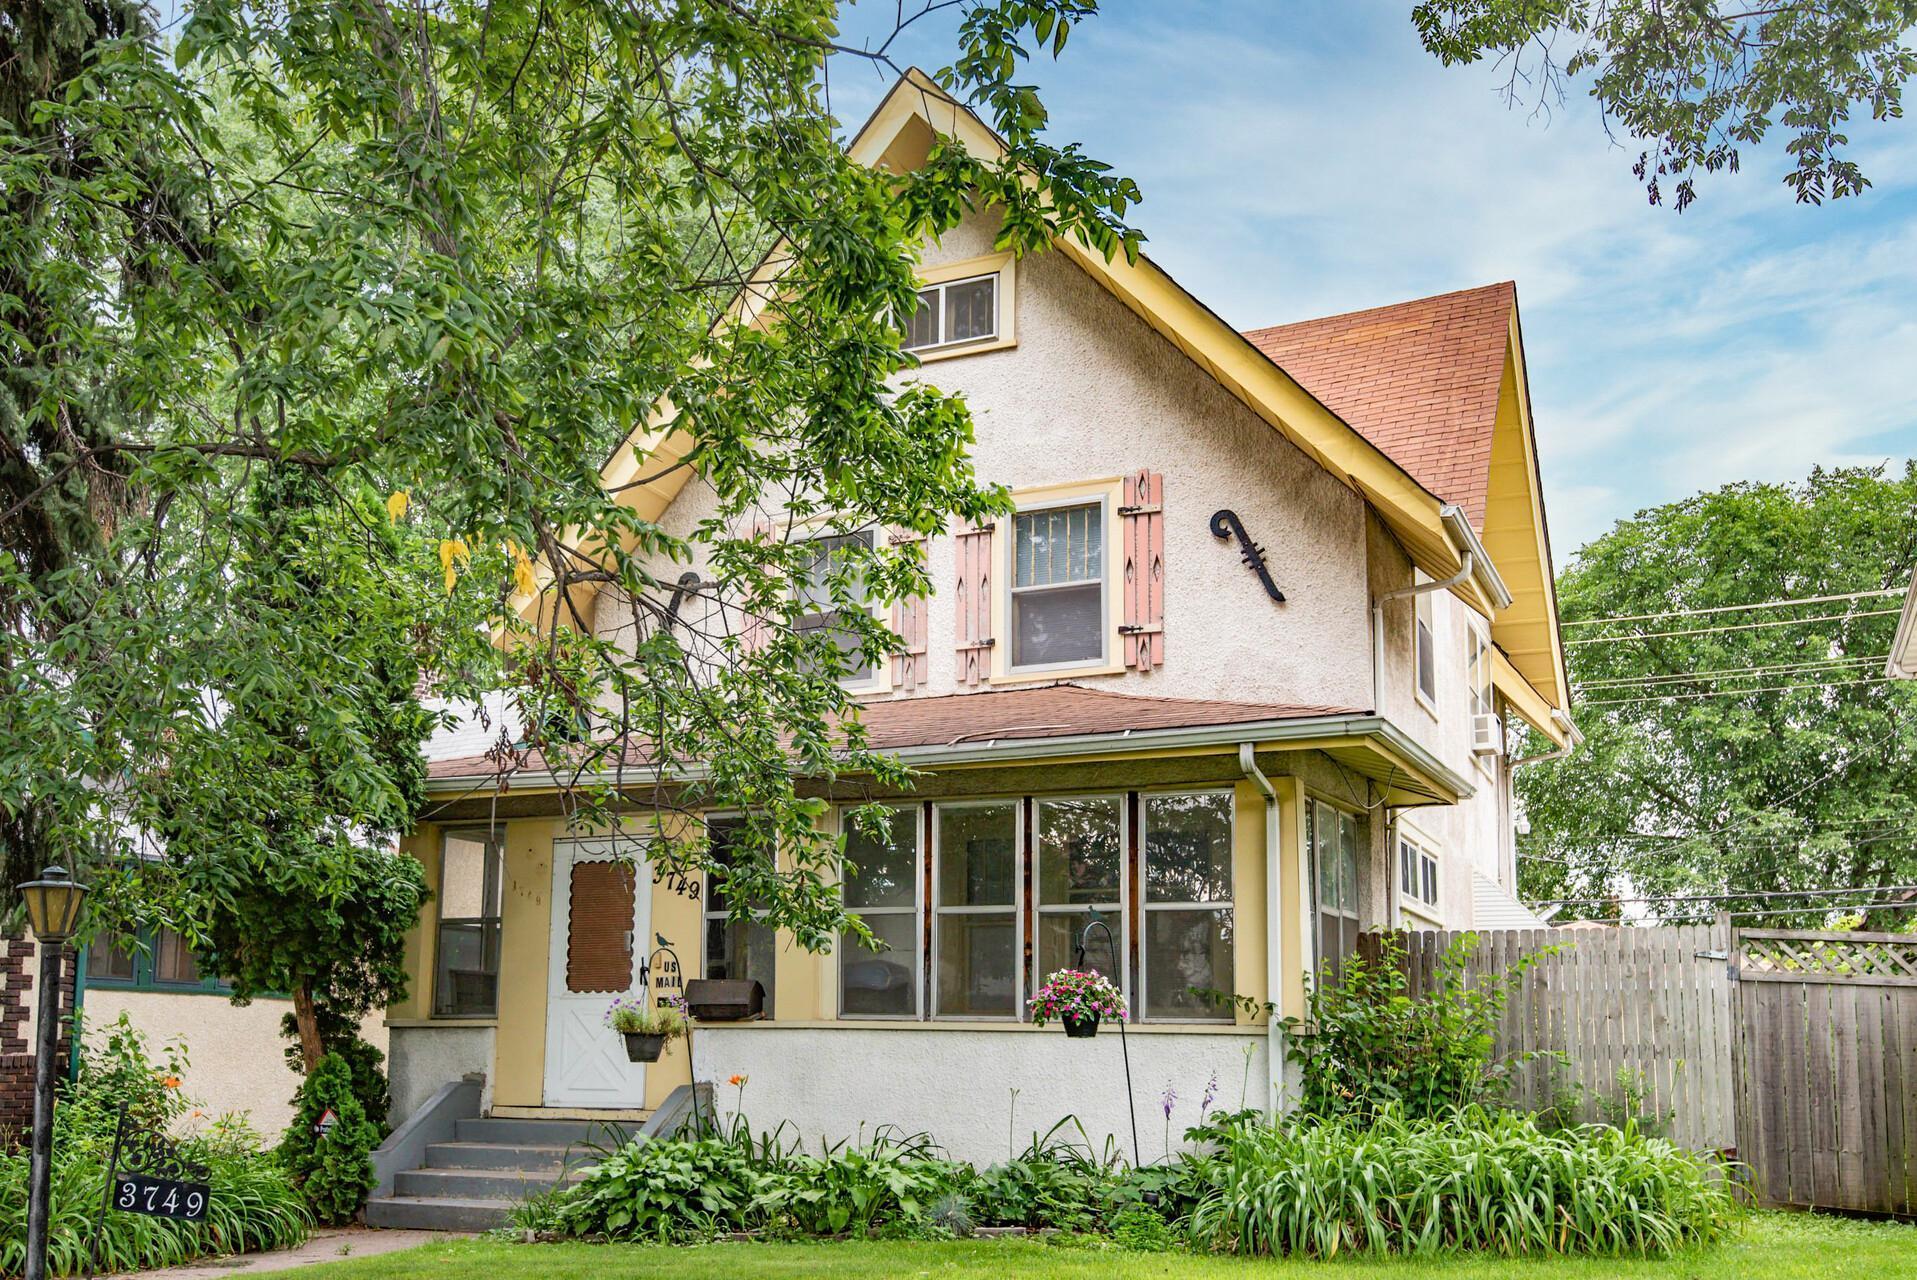 3749 Elliot Property Photo